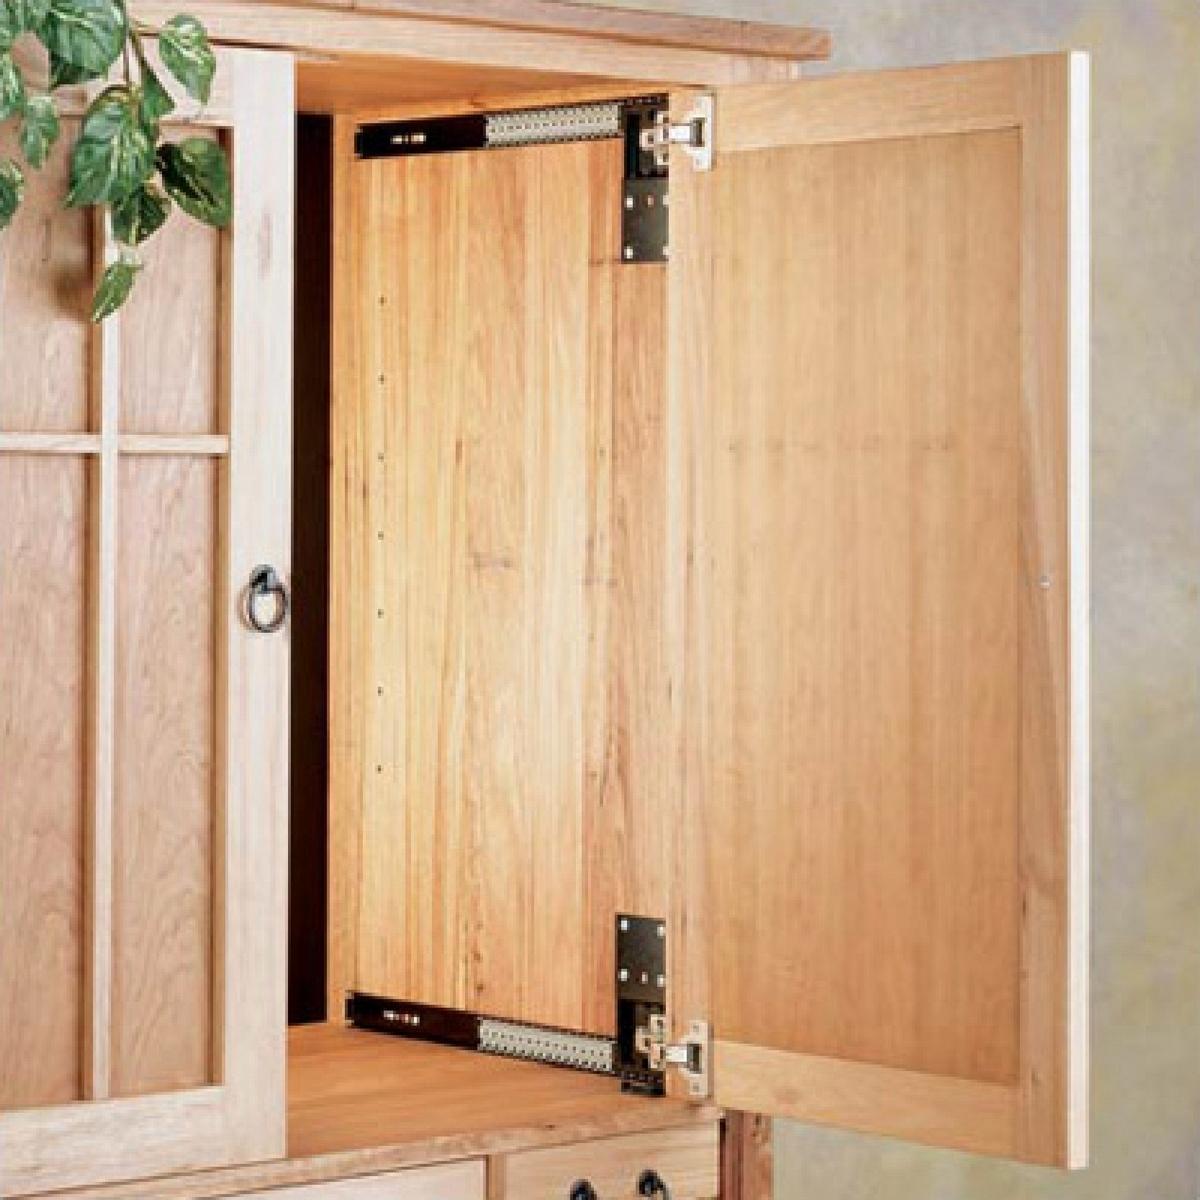 Xl Pivoting Pocket Door Slide System